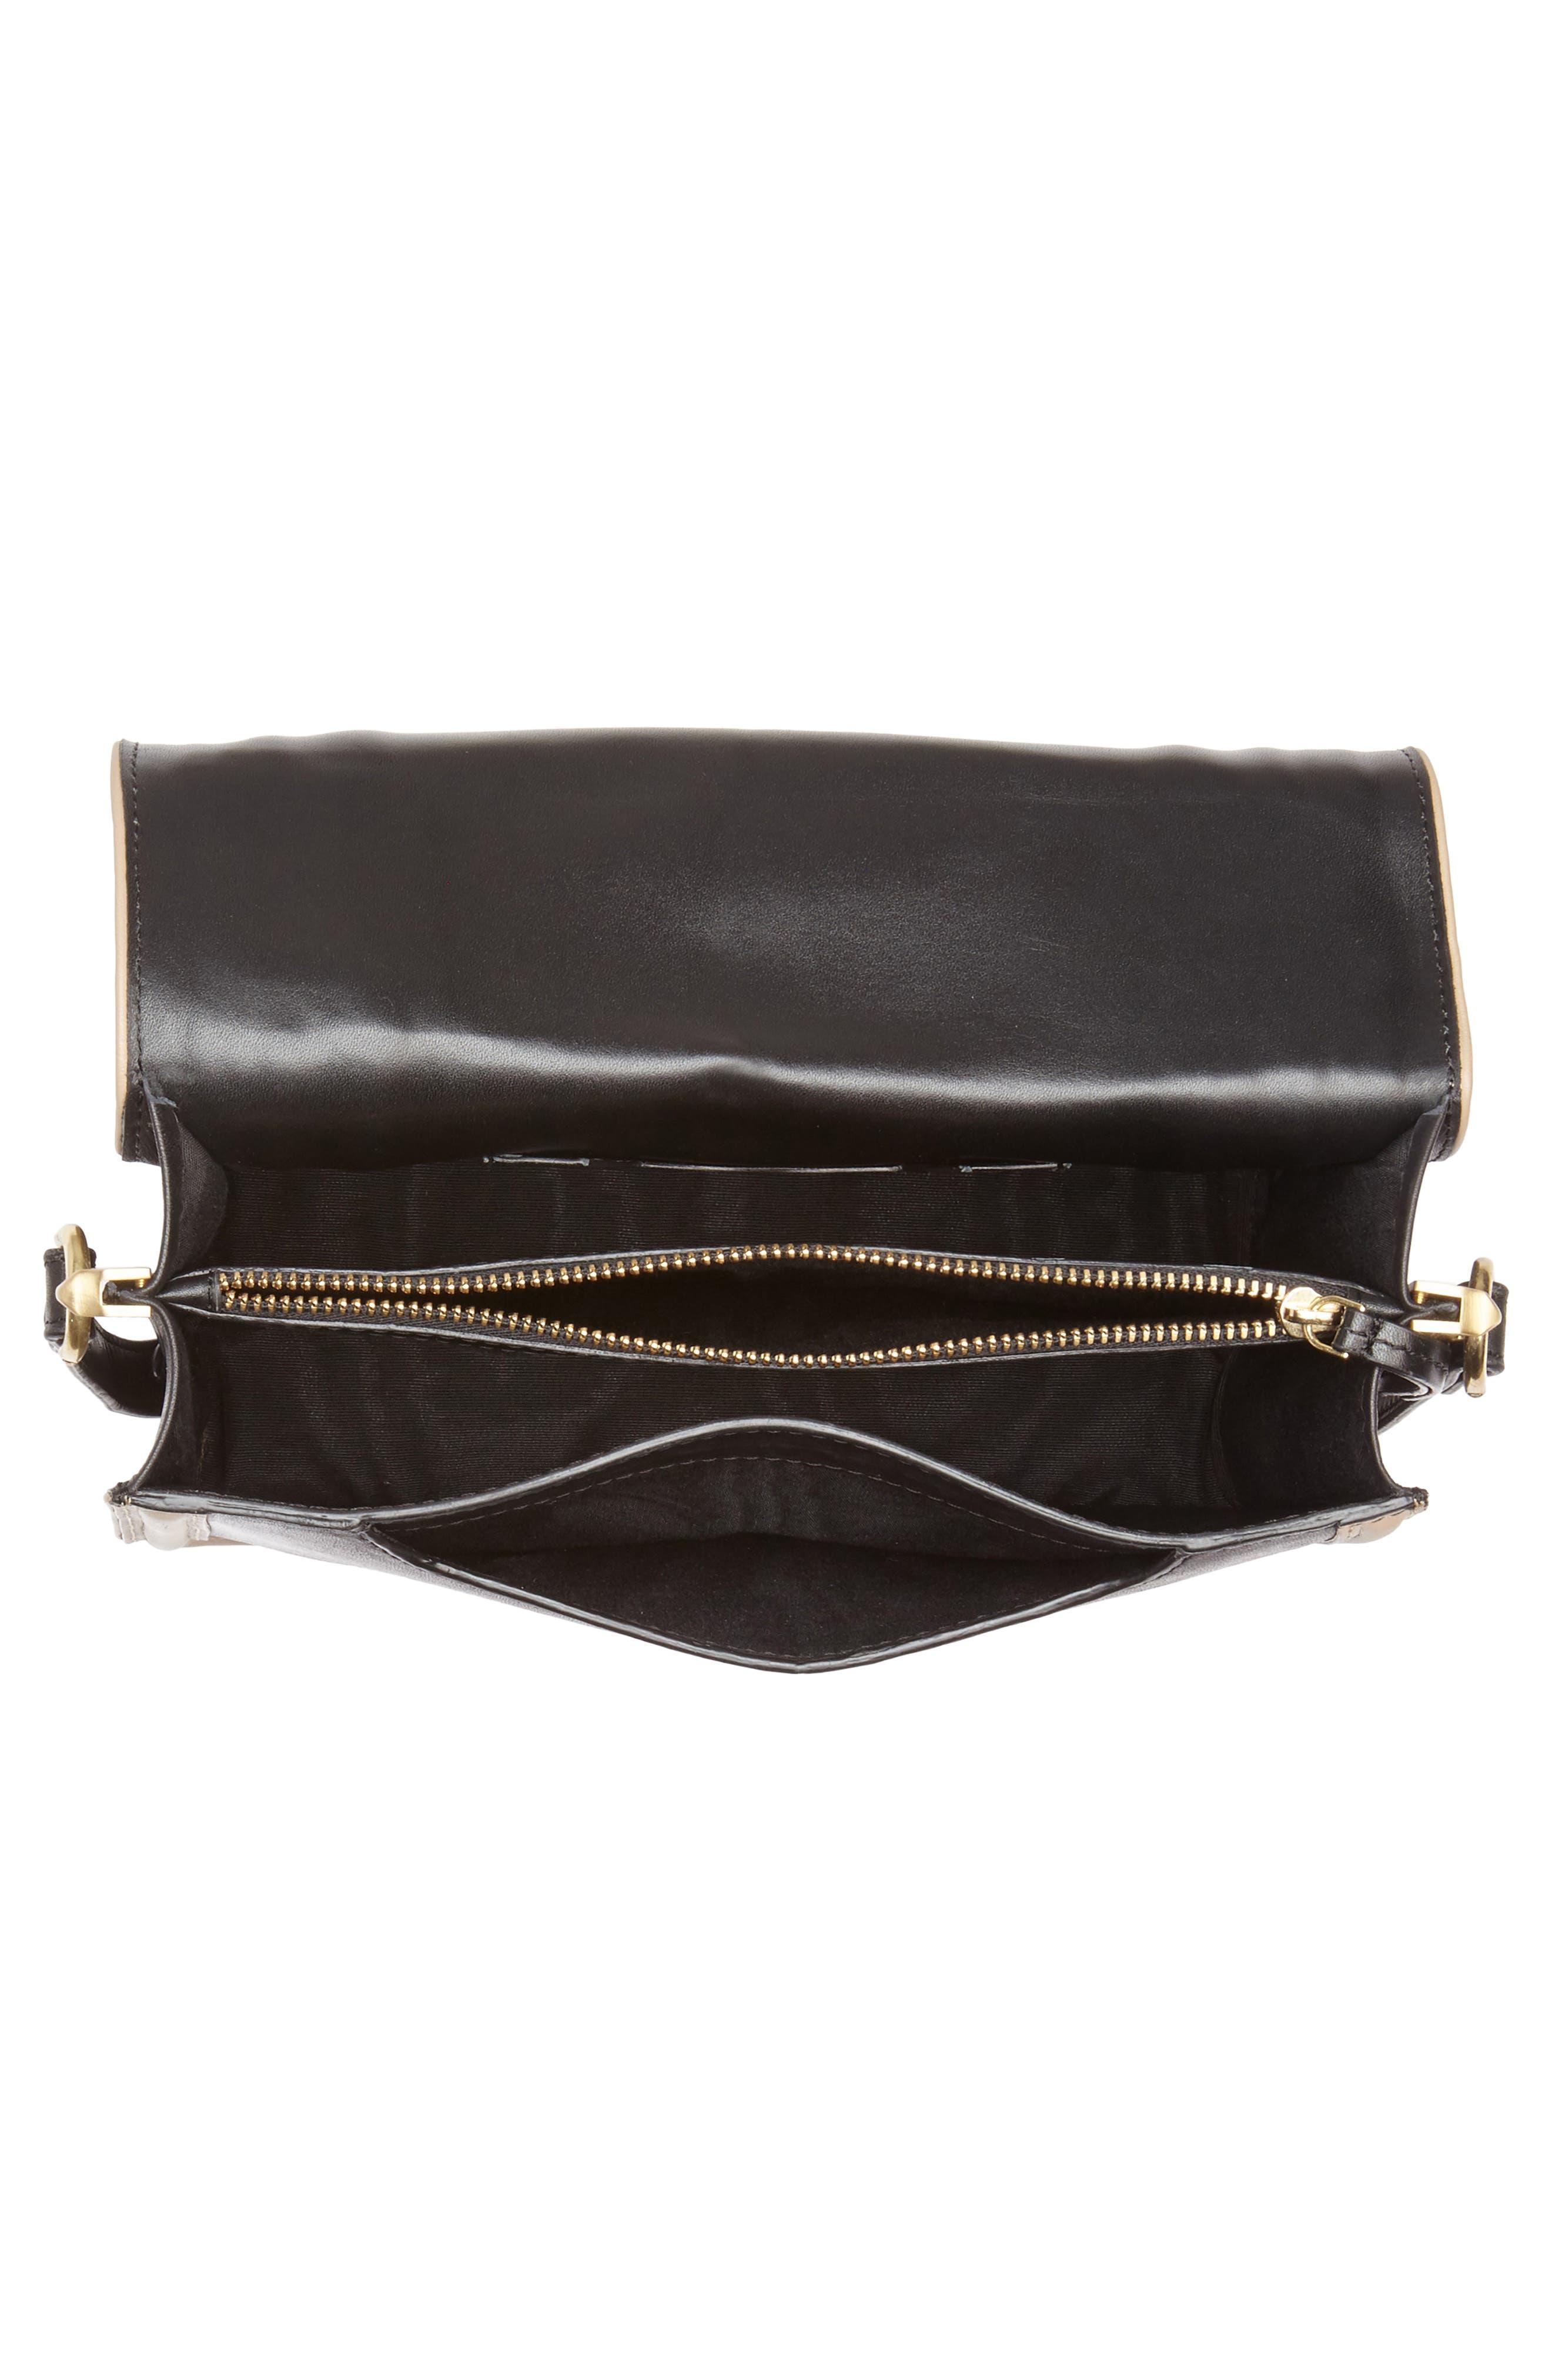 Small Square Top Handle Handbag,                             Alternate thumbnail 4, color,                             Black